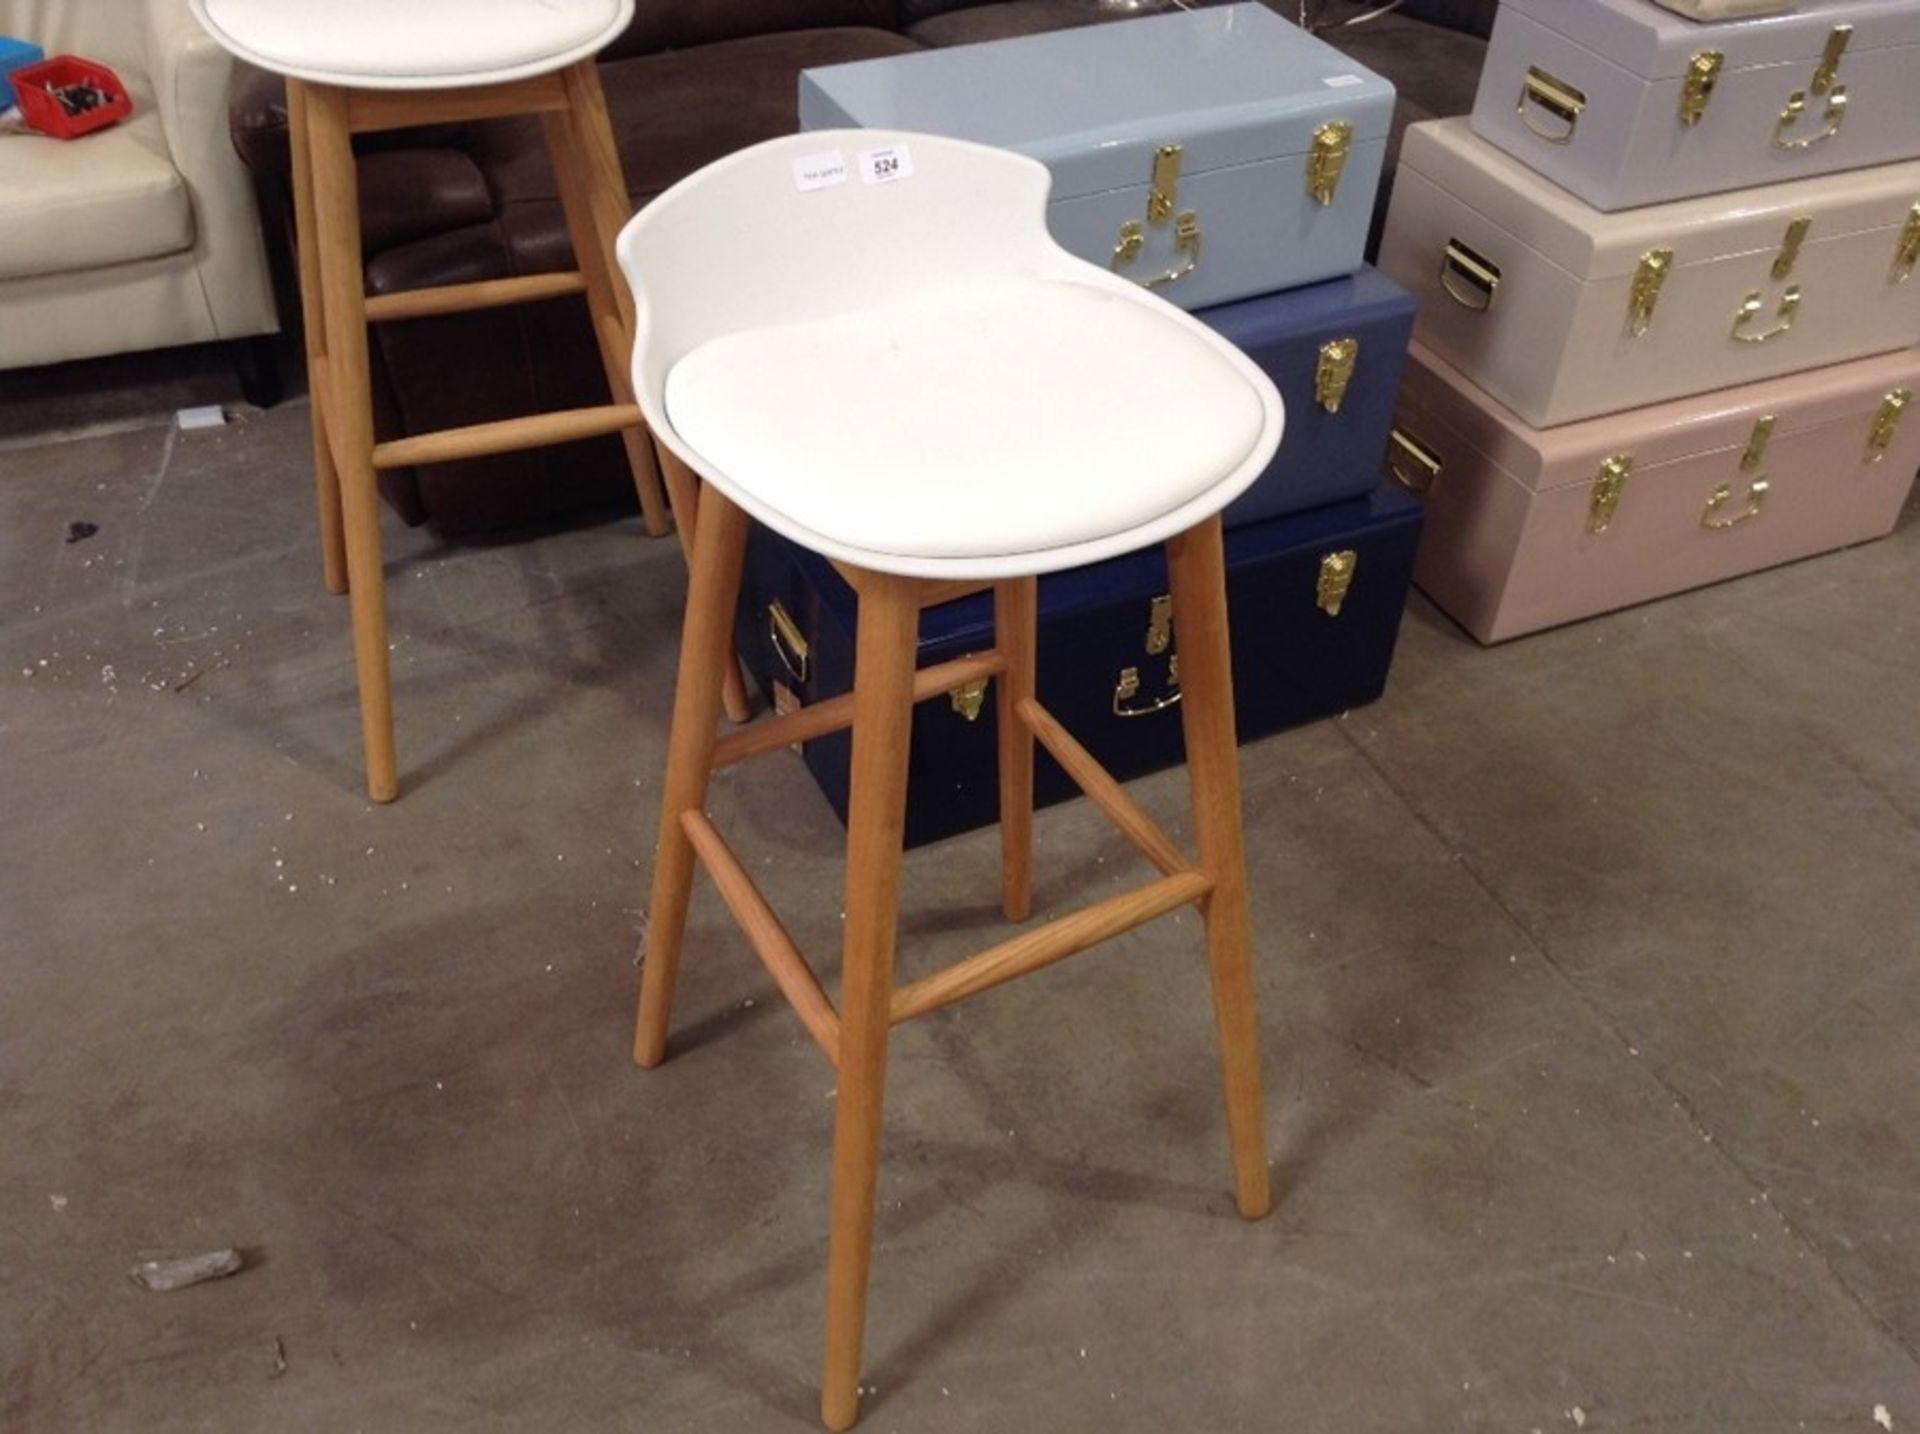 |1X|Made.com Thelma Barstool Oak and White RRP £99|1j0471/2 -BARTHM004WHI-UK|